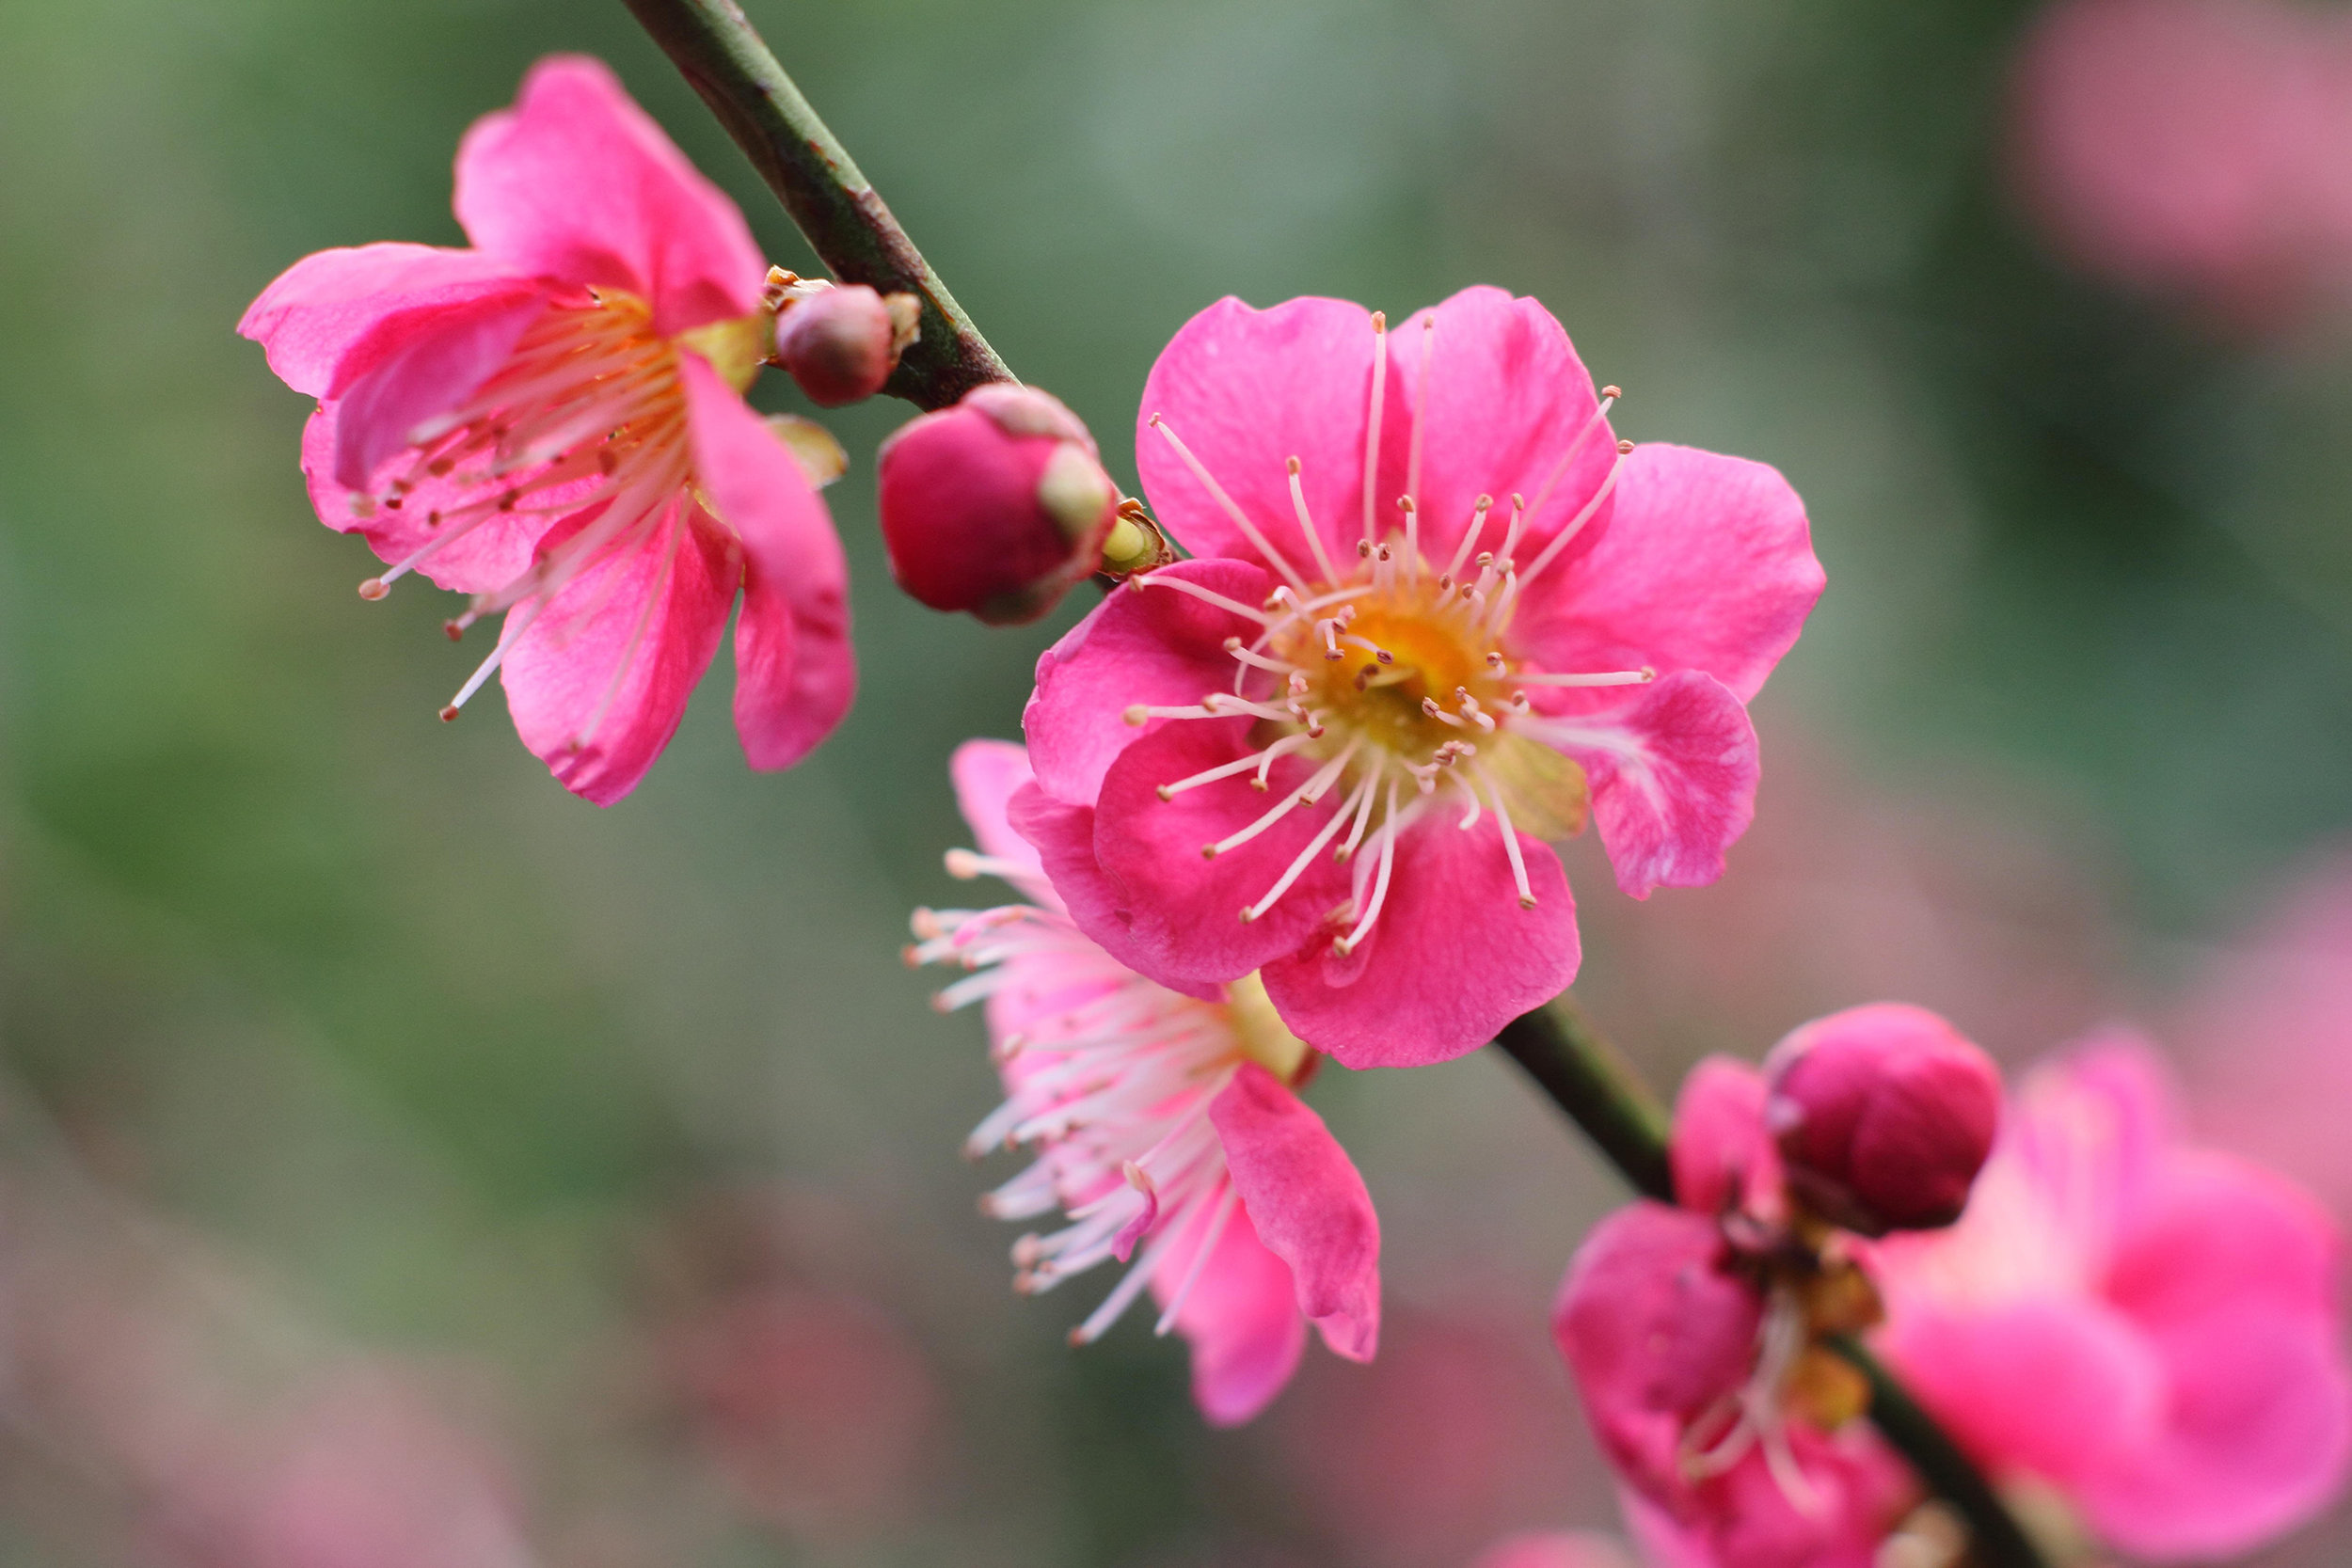 Prunus mume 'Beni Shidori'